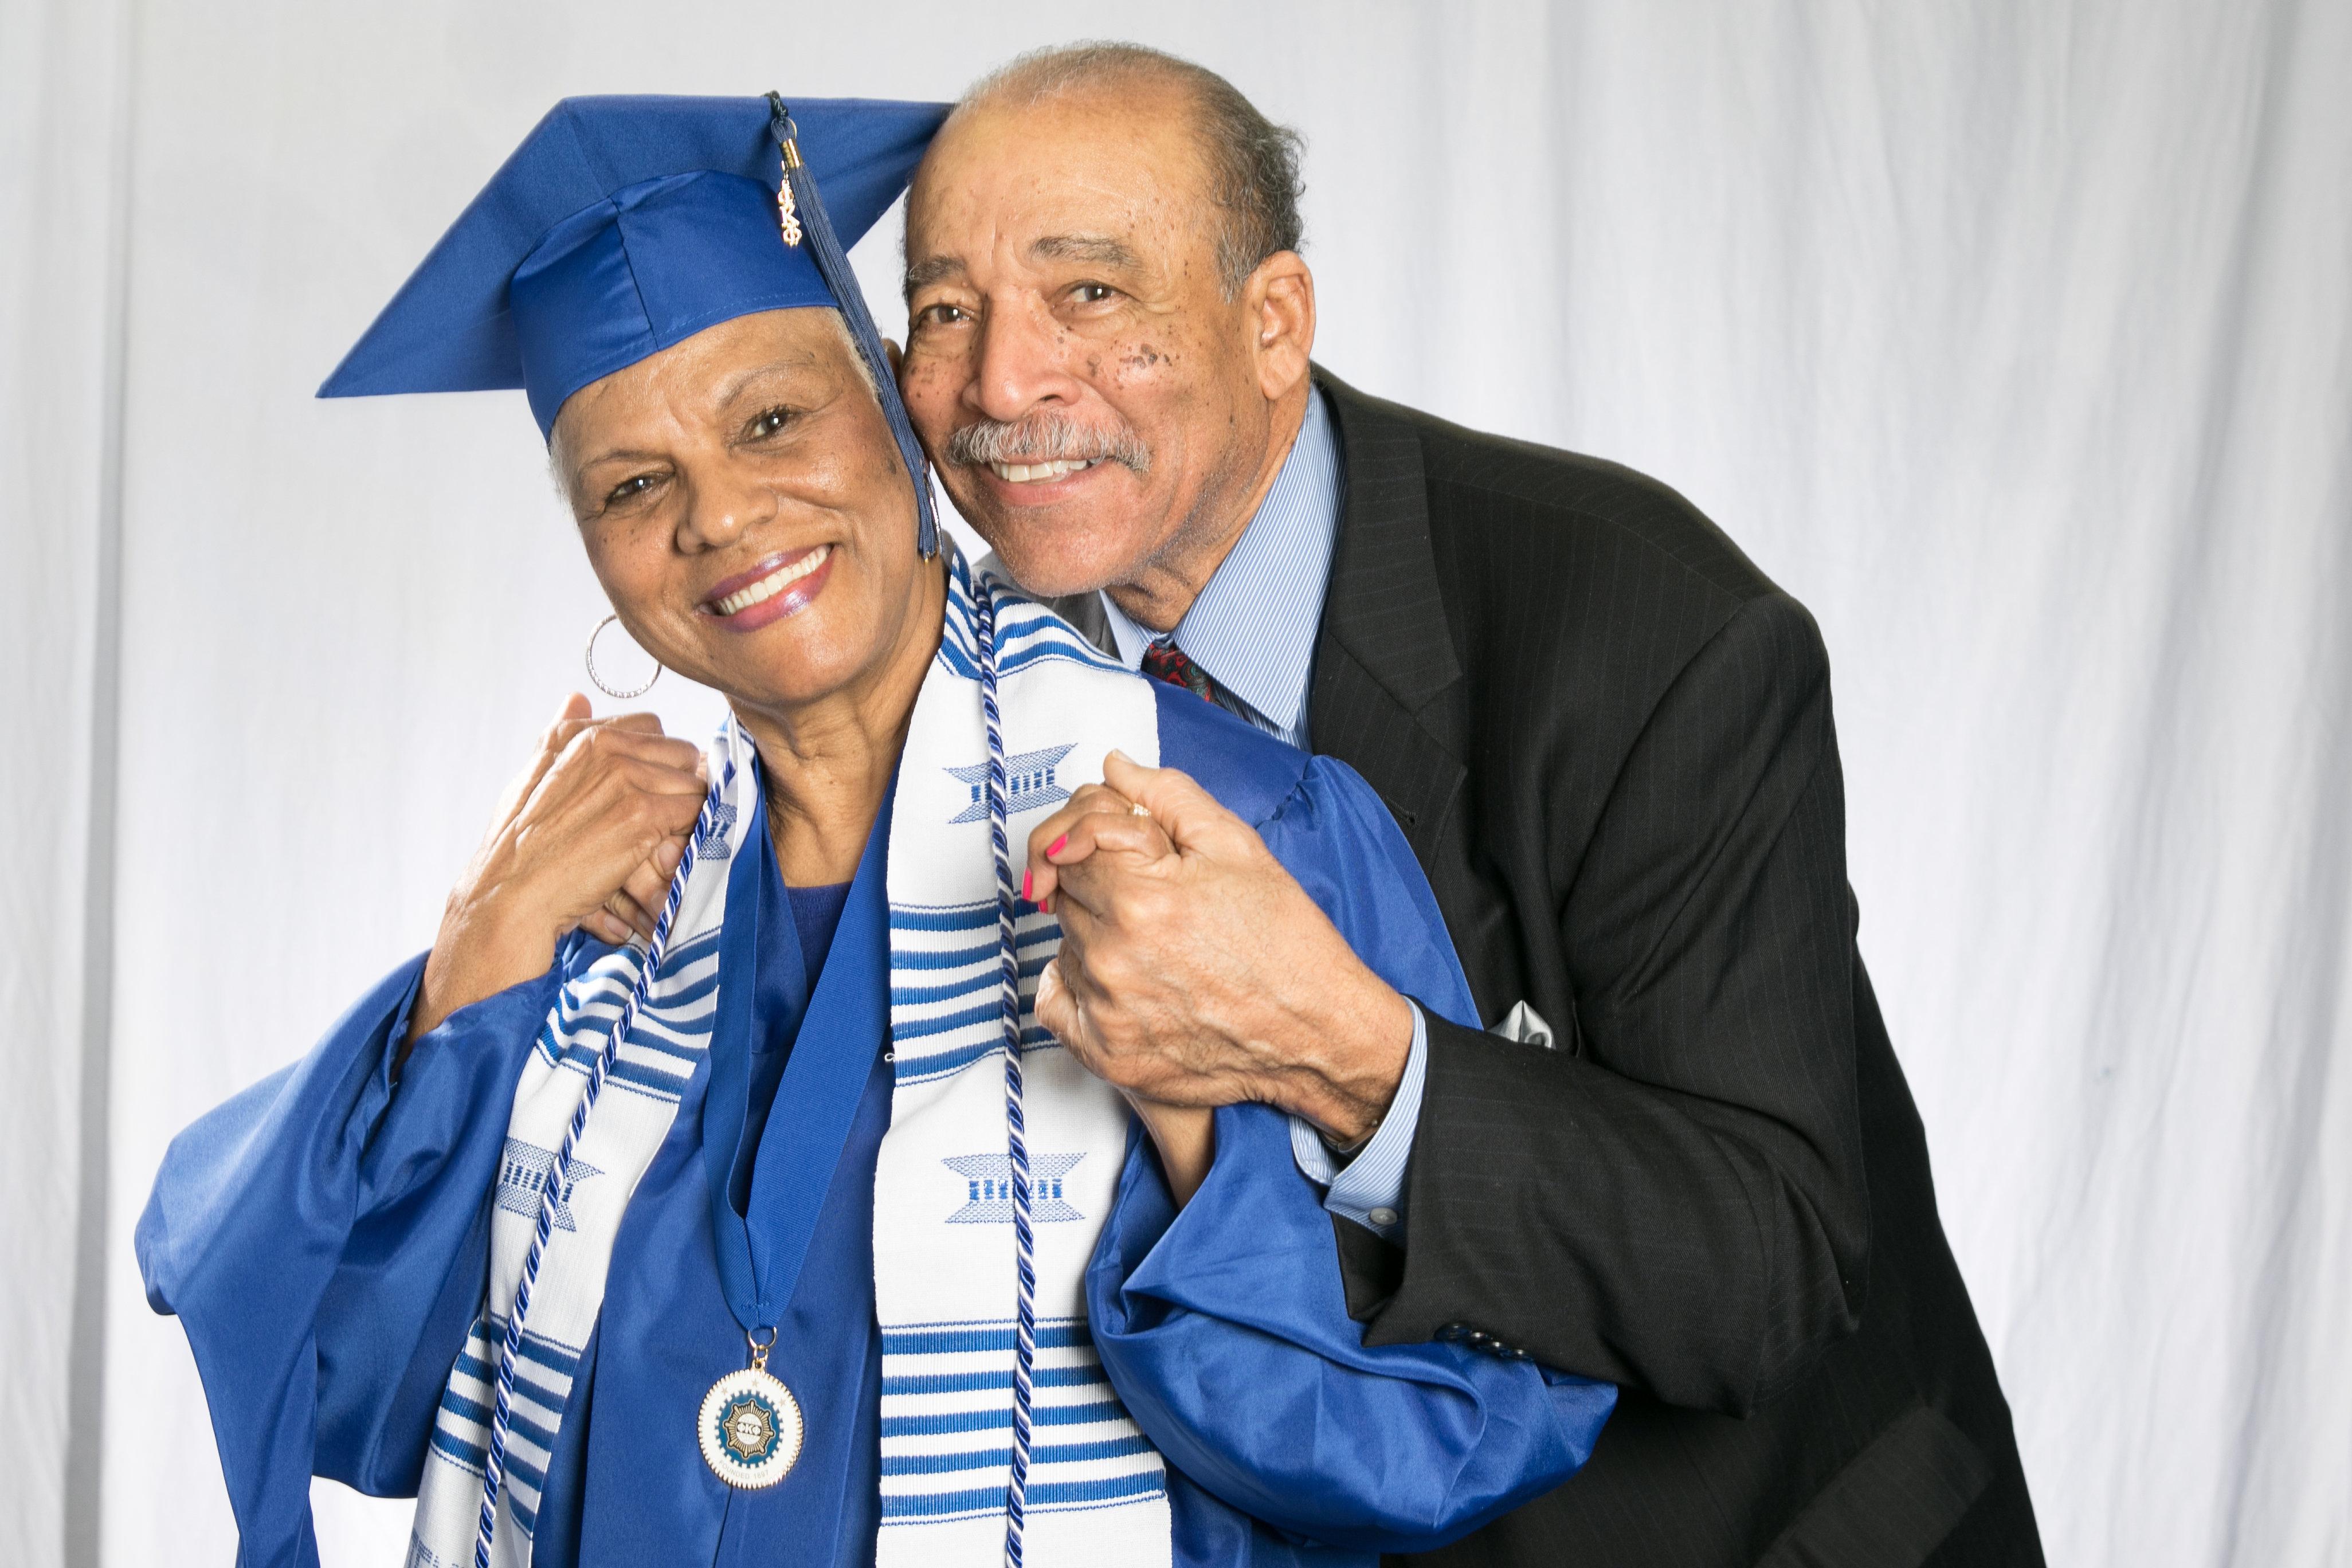 Now, both Darlene and John can call themselves TSU alumni.